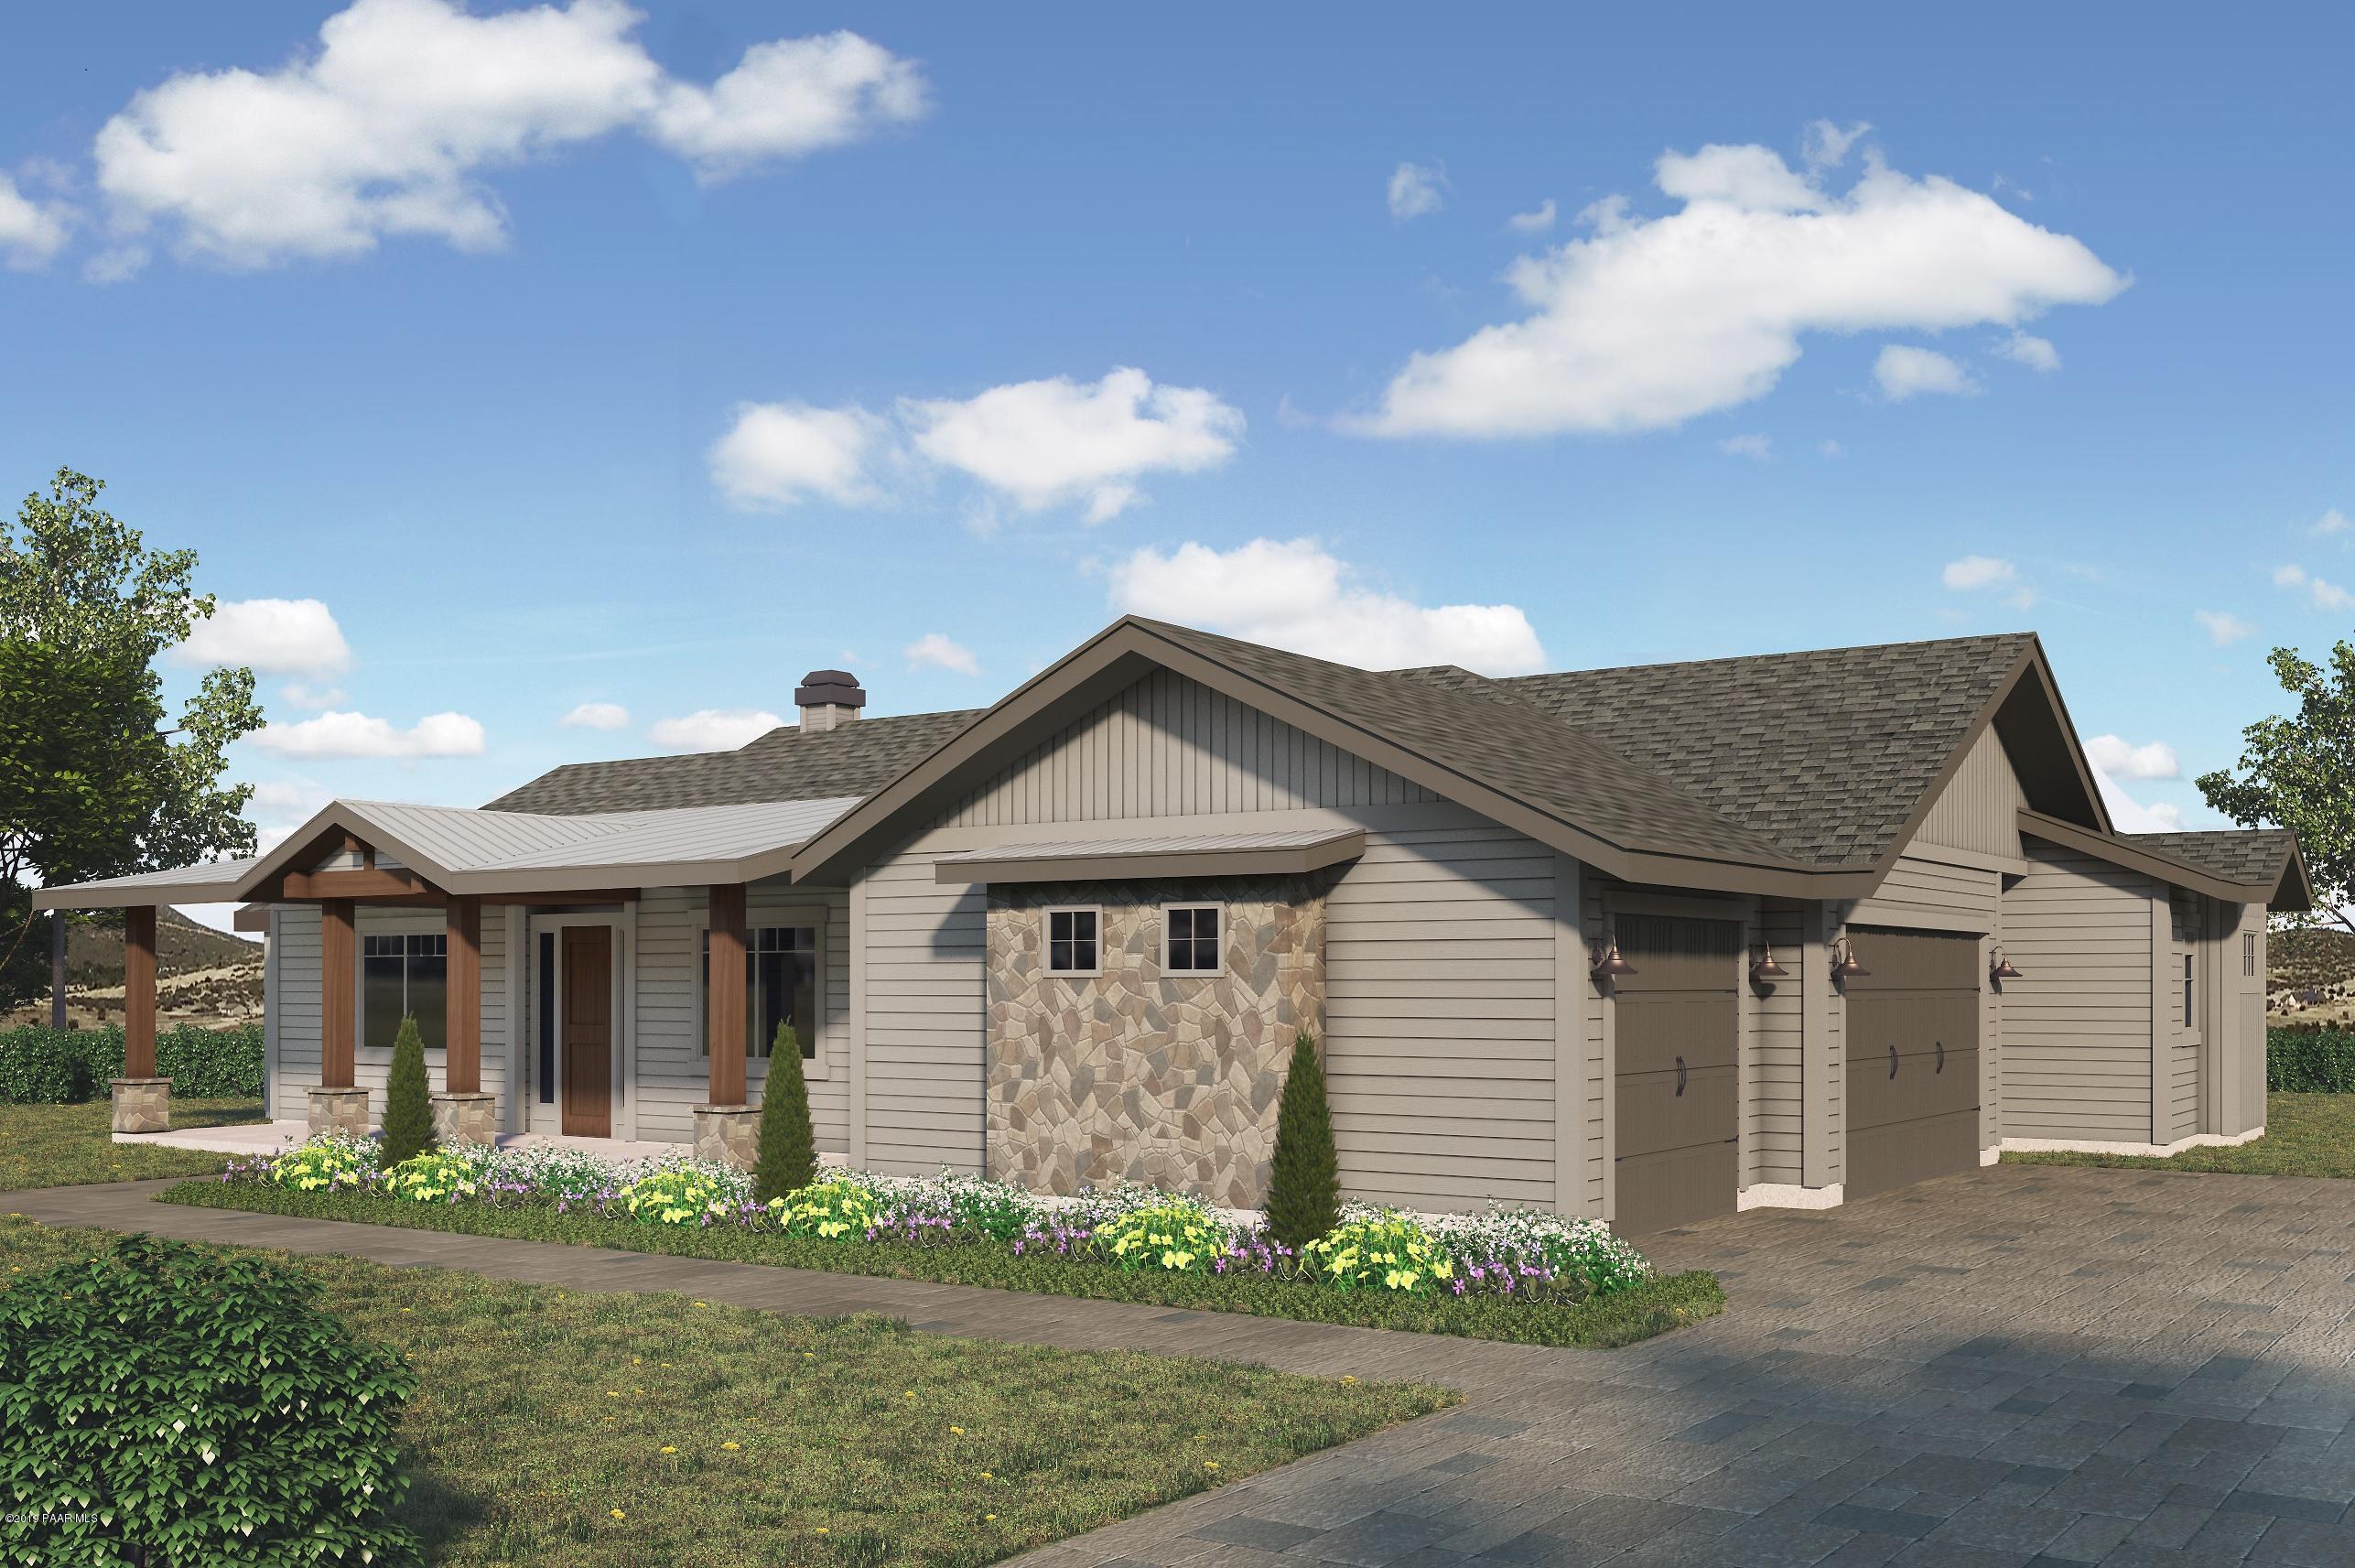 0  Gallop Way, Prescott Valley in Yavapai County, AZ 86301 Home for Sale